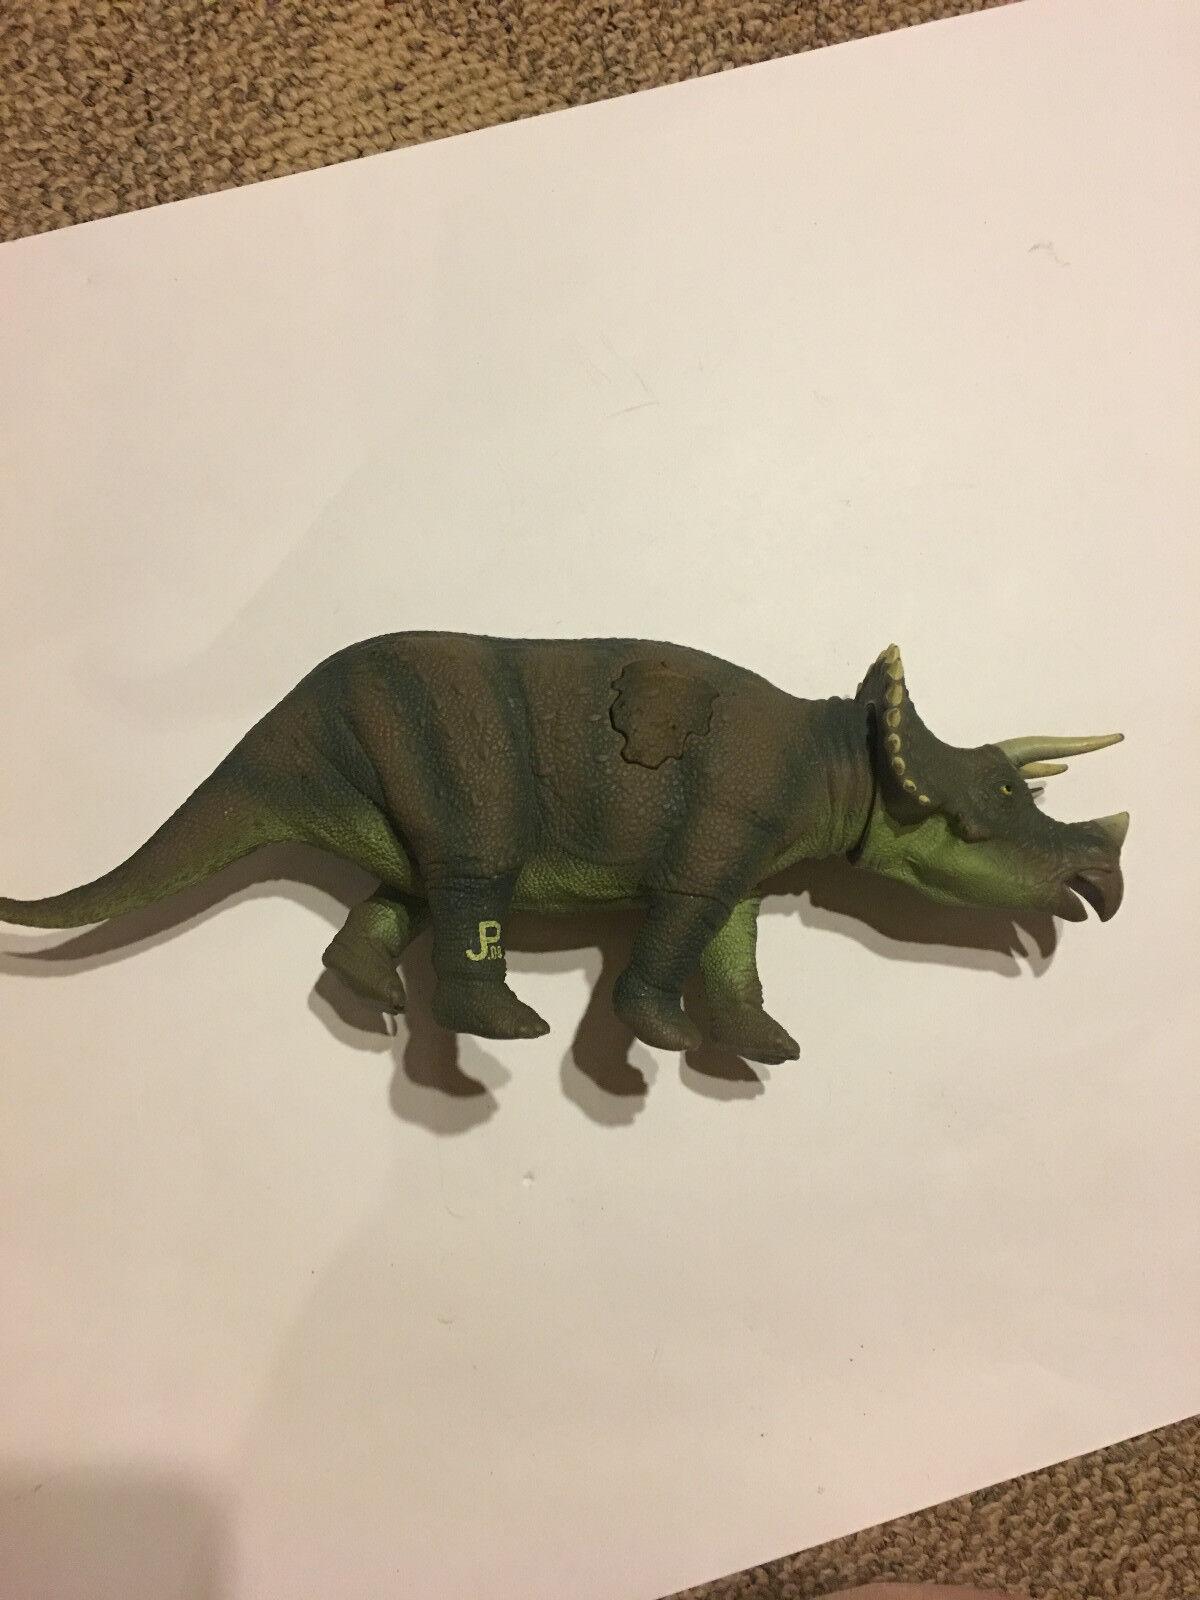 JURASSIC PARK LOST WORLD triceratops DINOSAUR FIGURE dino damage